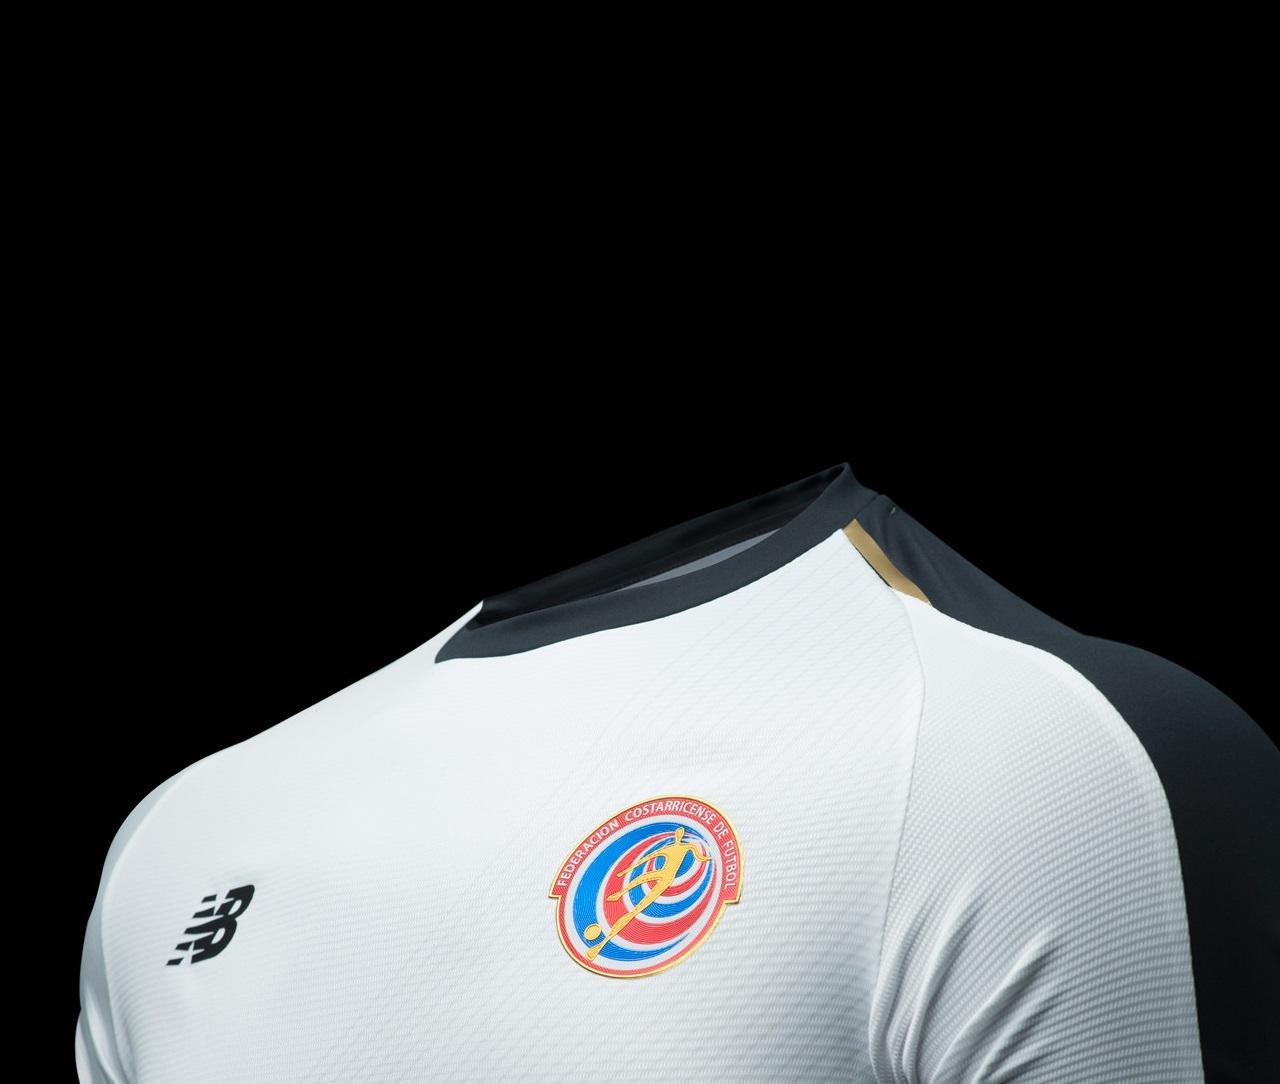 Costa Rica 2018 maillot football exterieur coupe du monde 2018